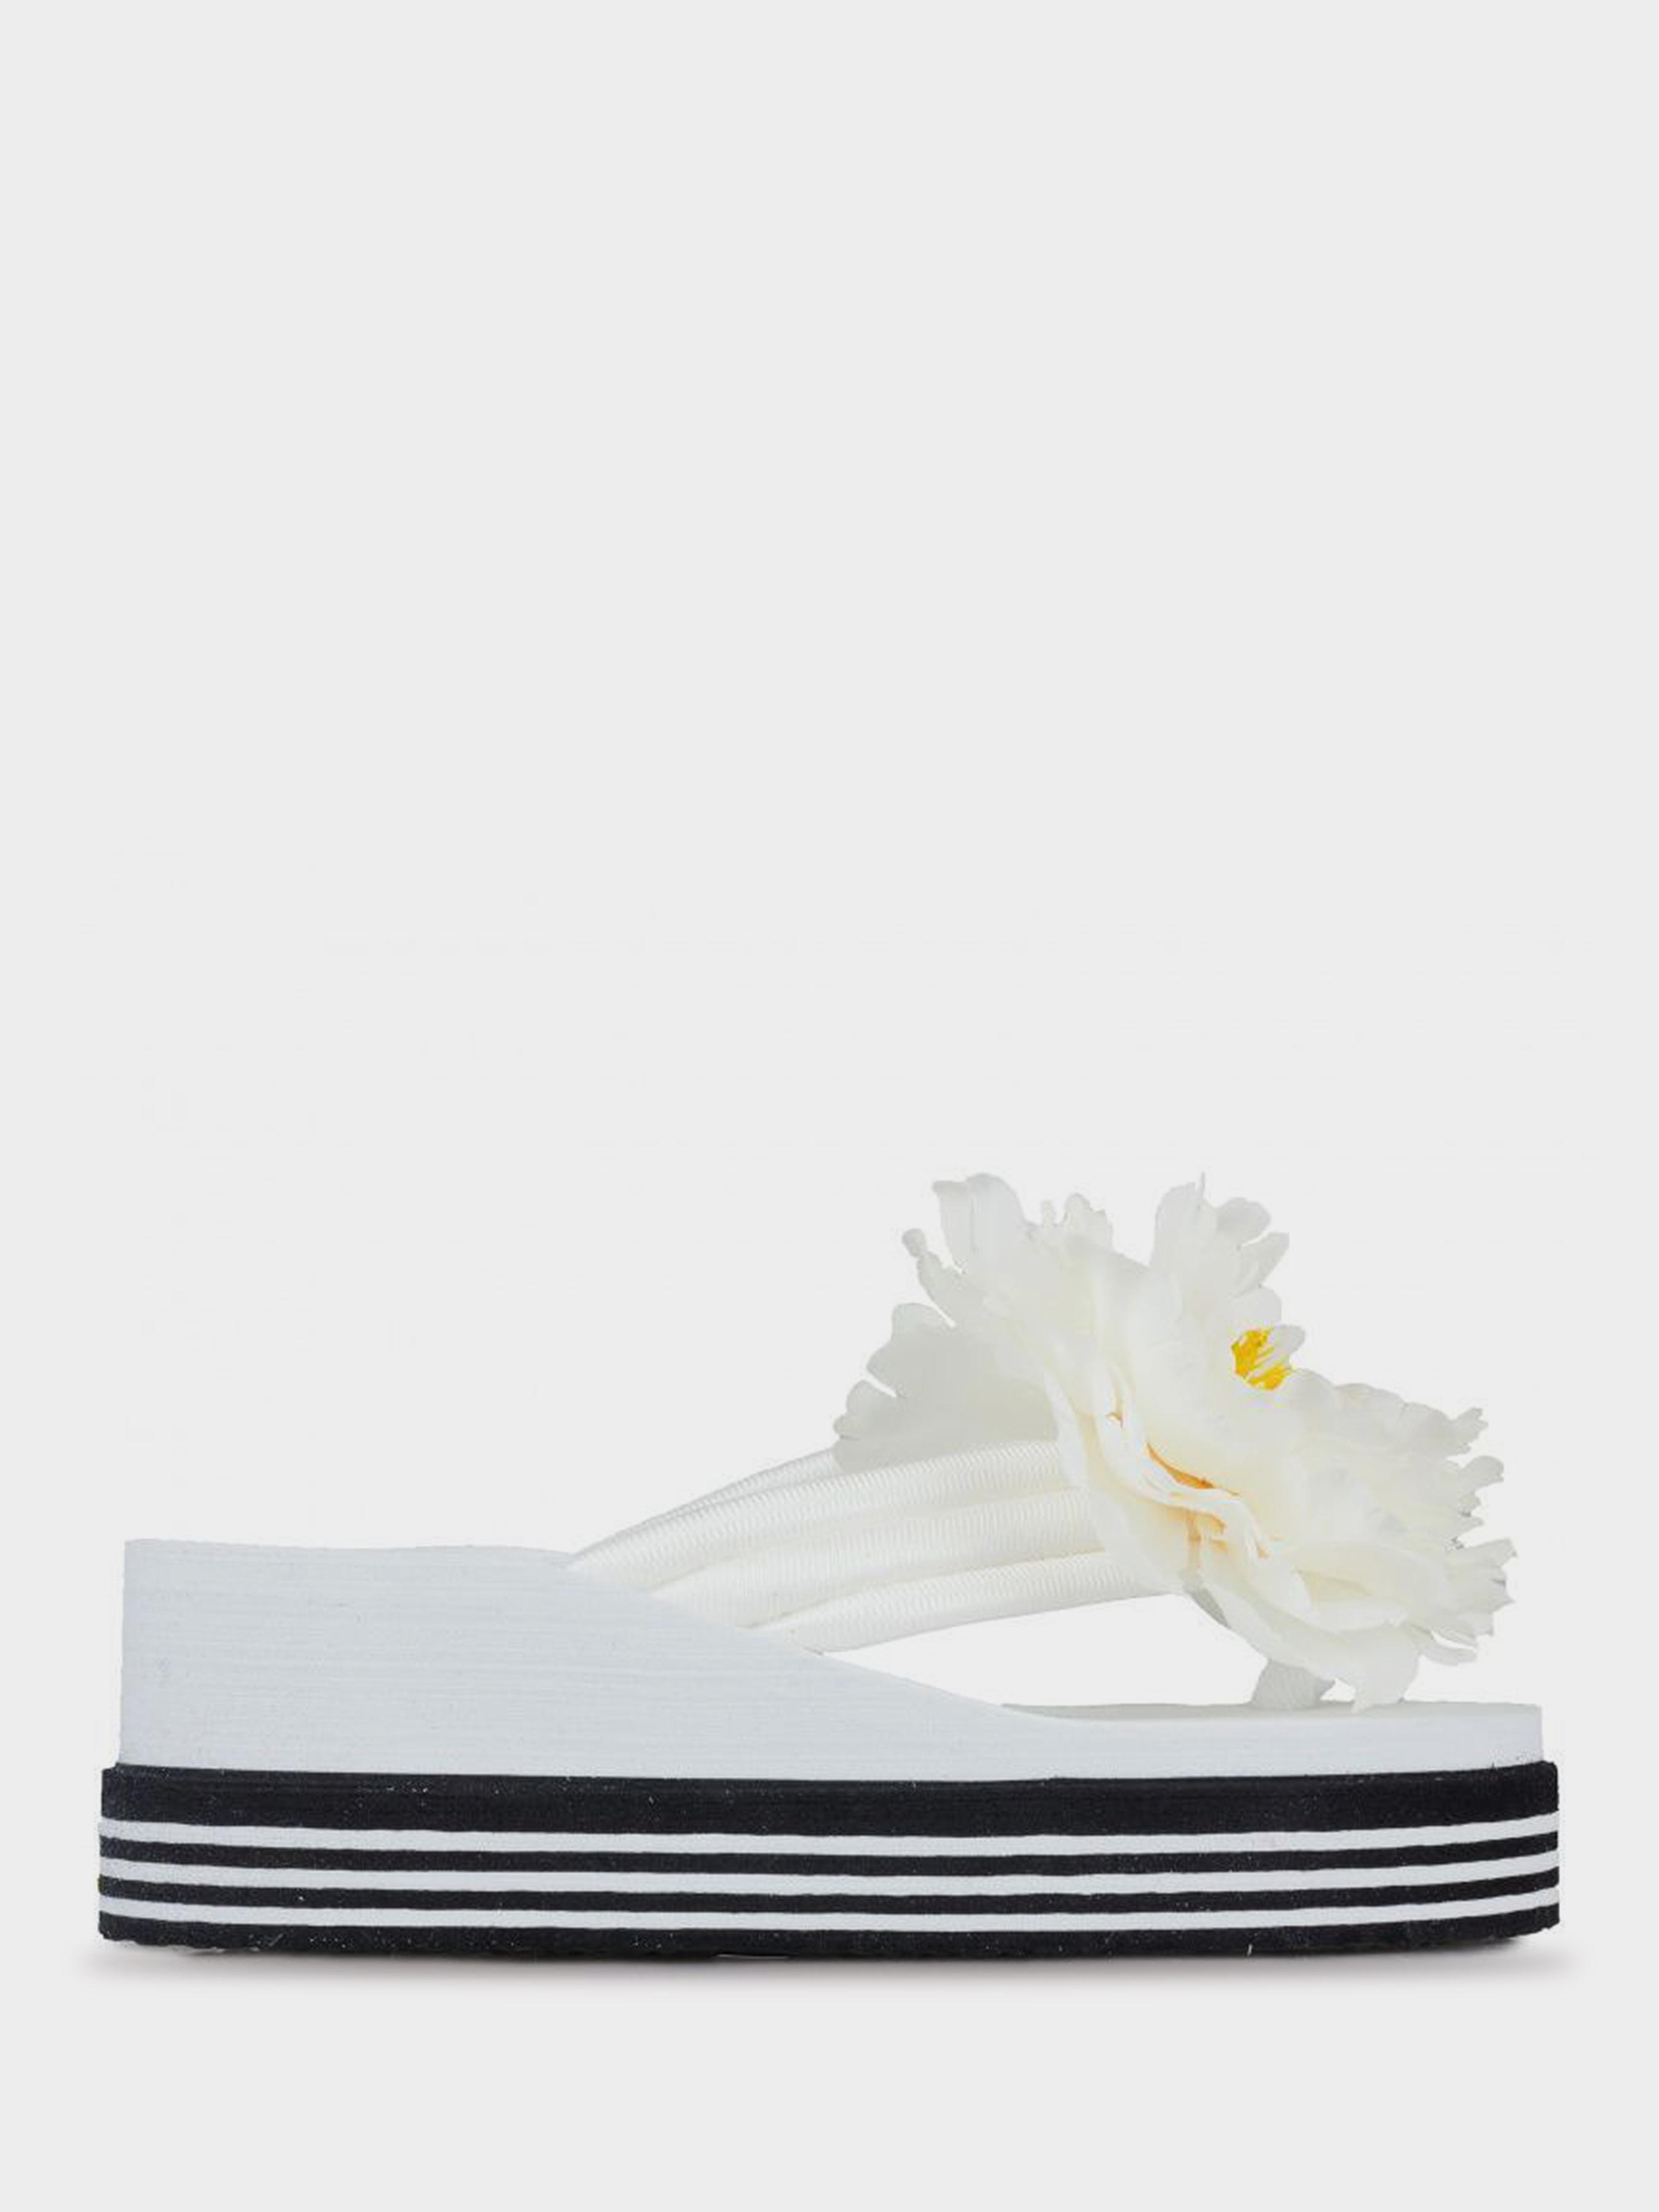 Шлёпанцы для женщин Braska BS2912 размерная сетка обуви, 2017